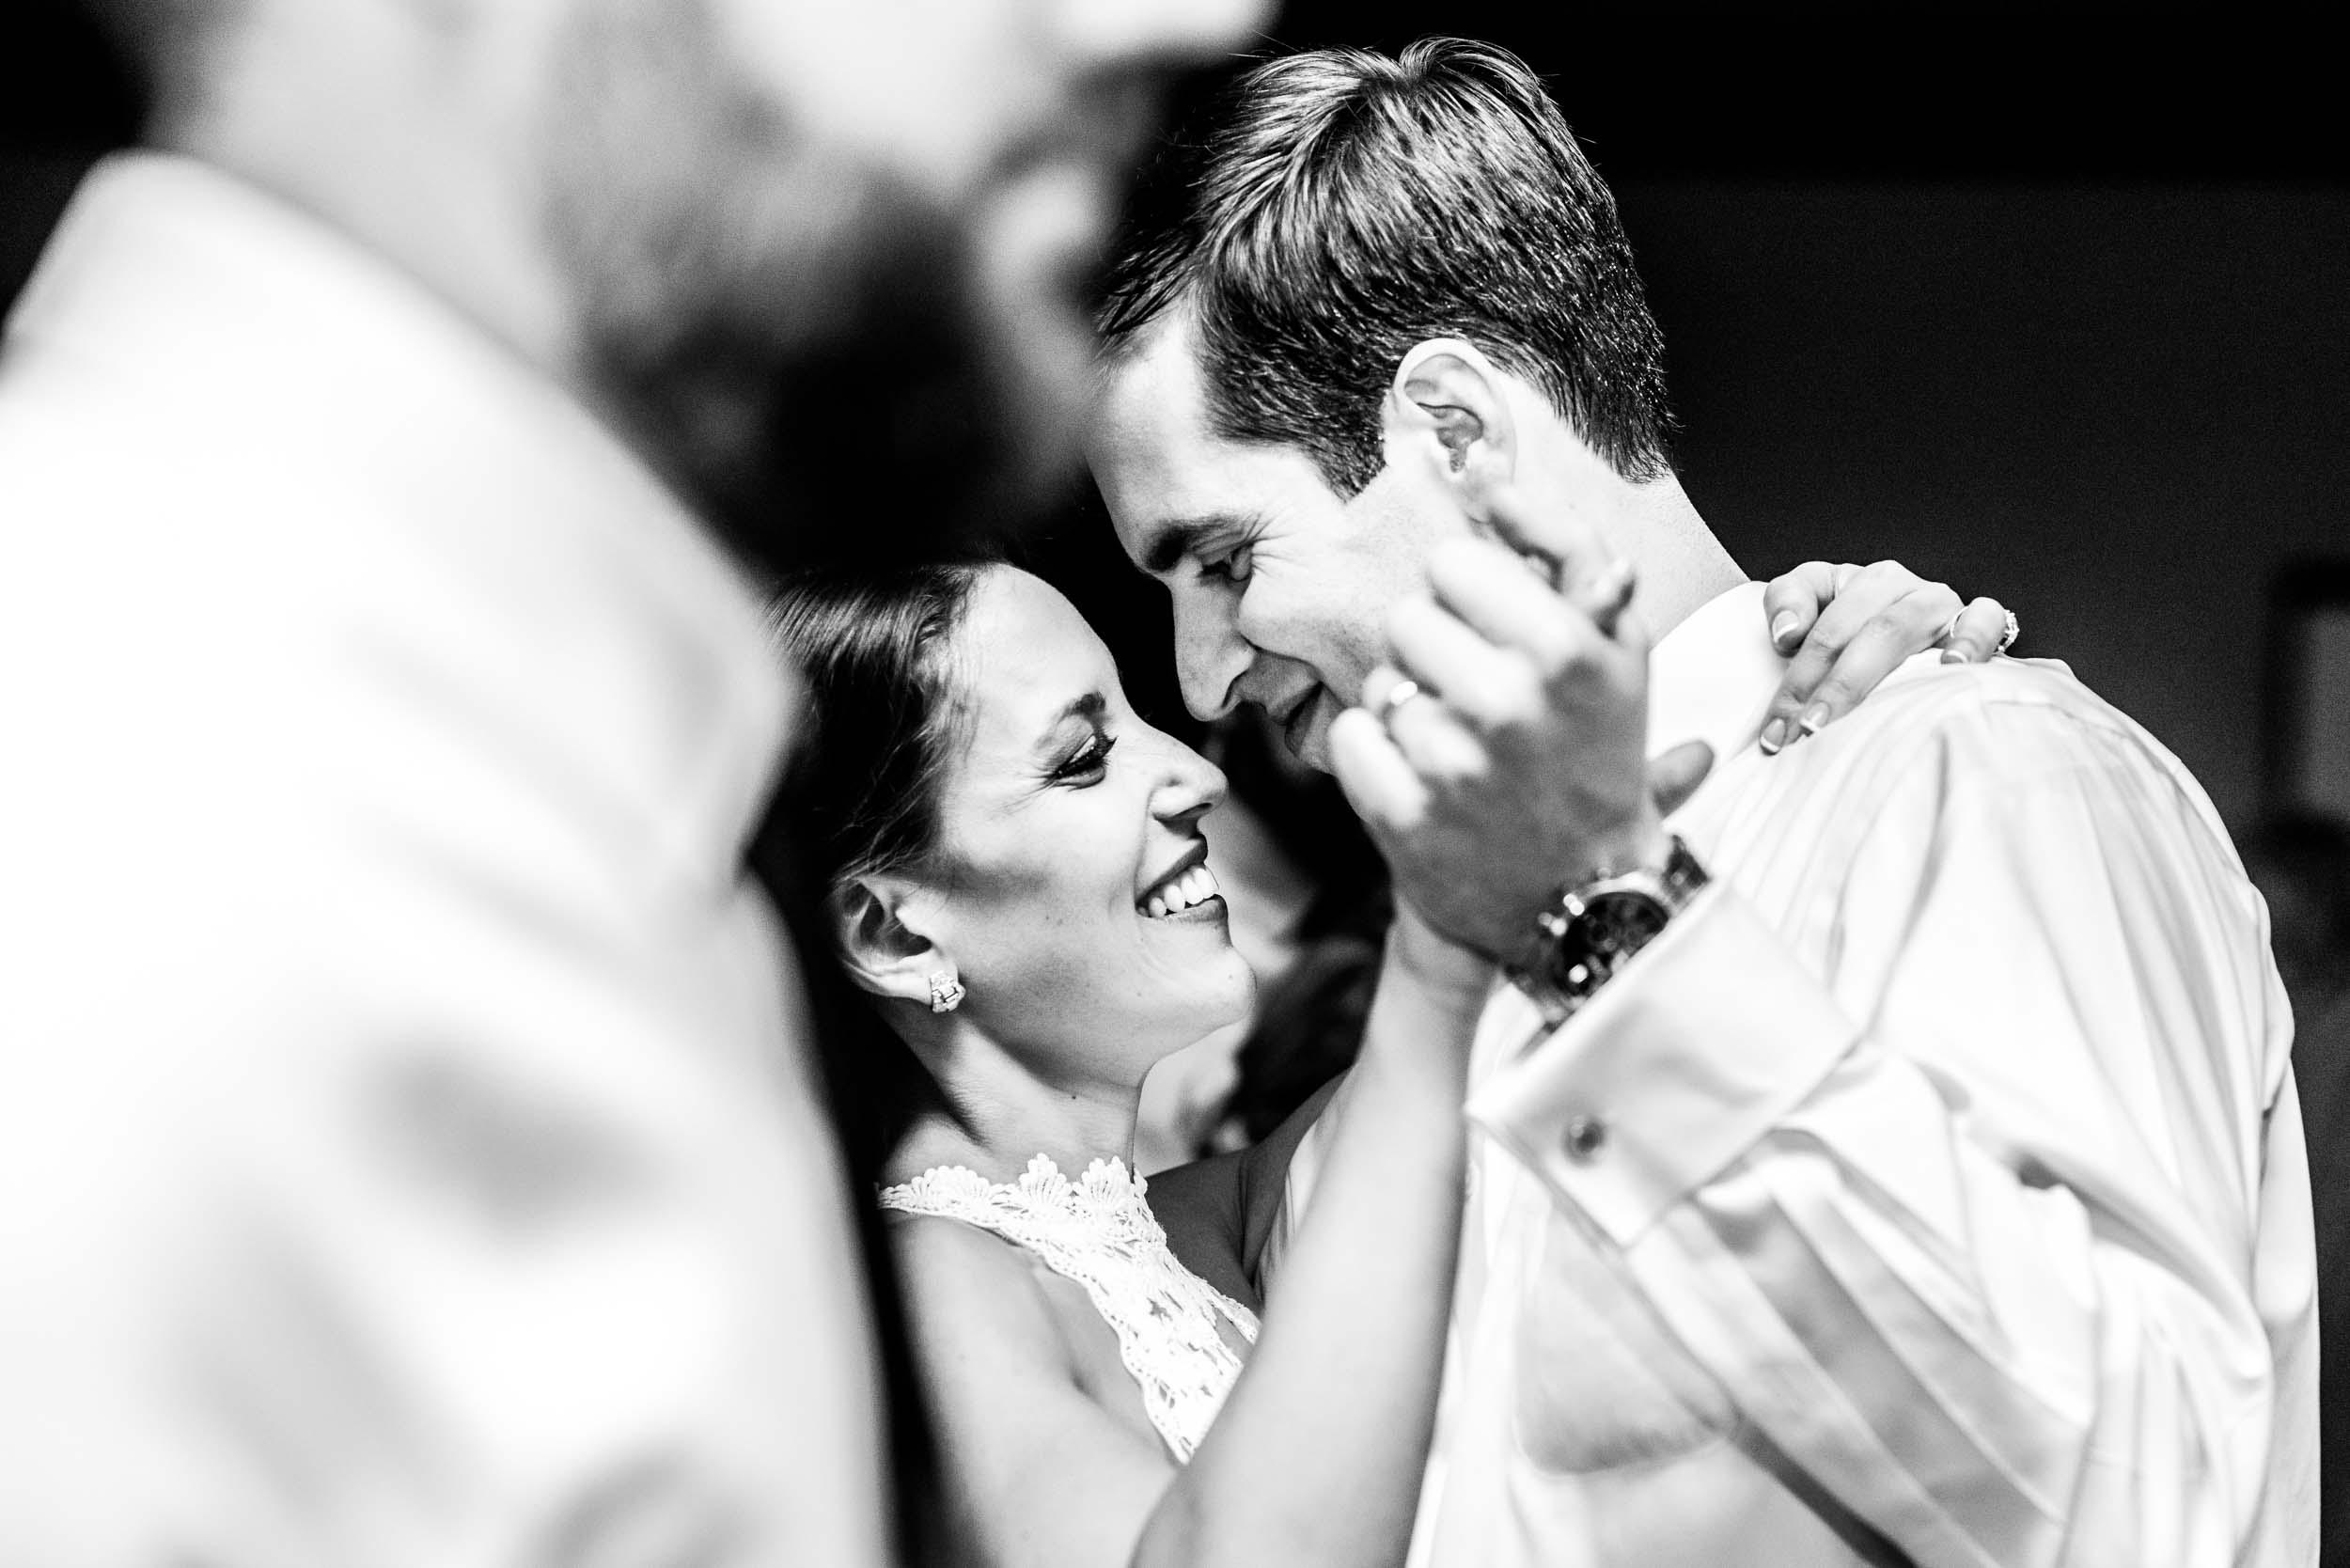 dc+metro+wedding+photographer+vadym+guliuk+photography+wedding+reception-2032.jpg